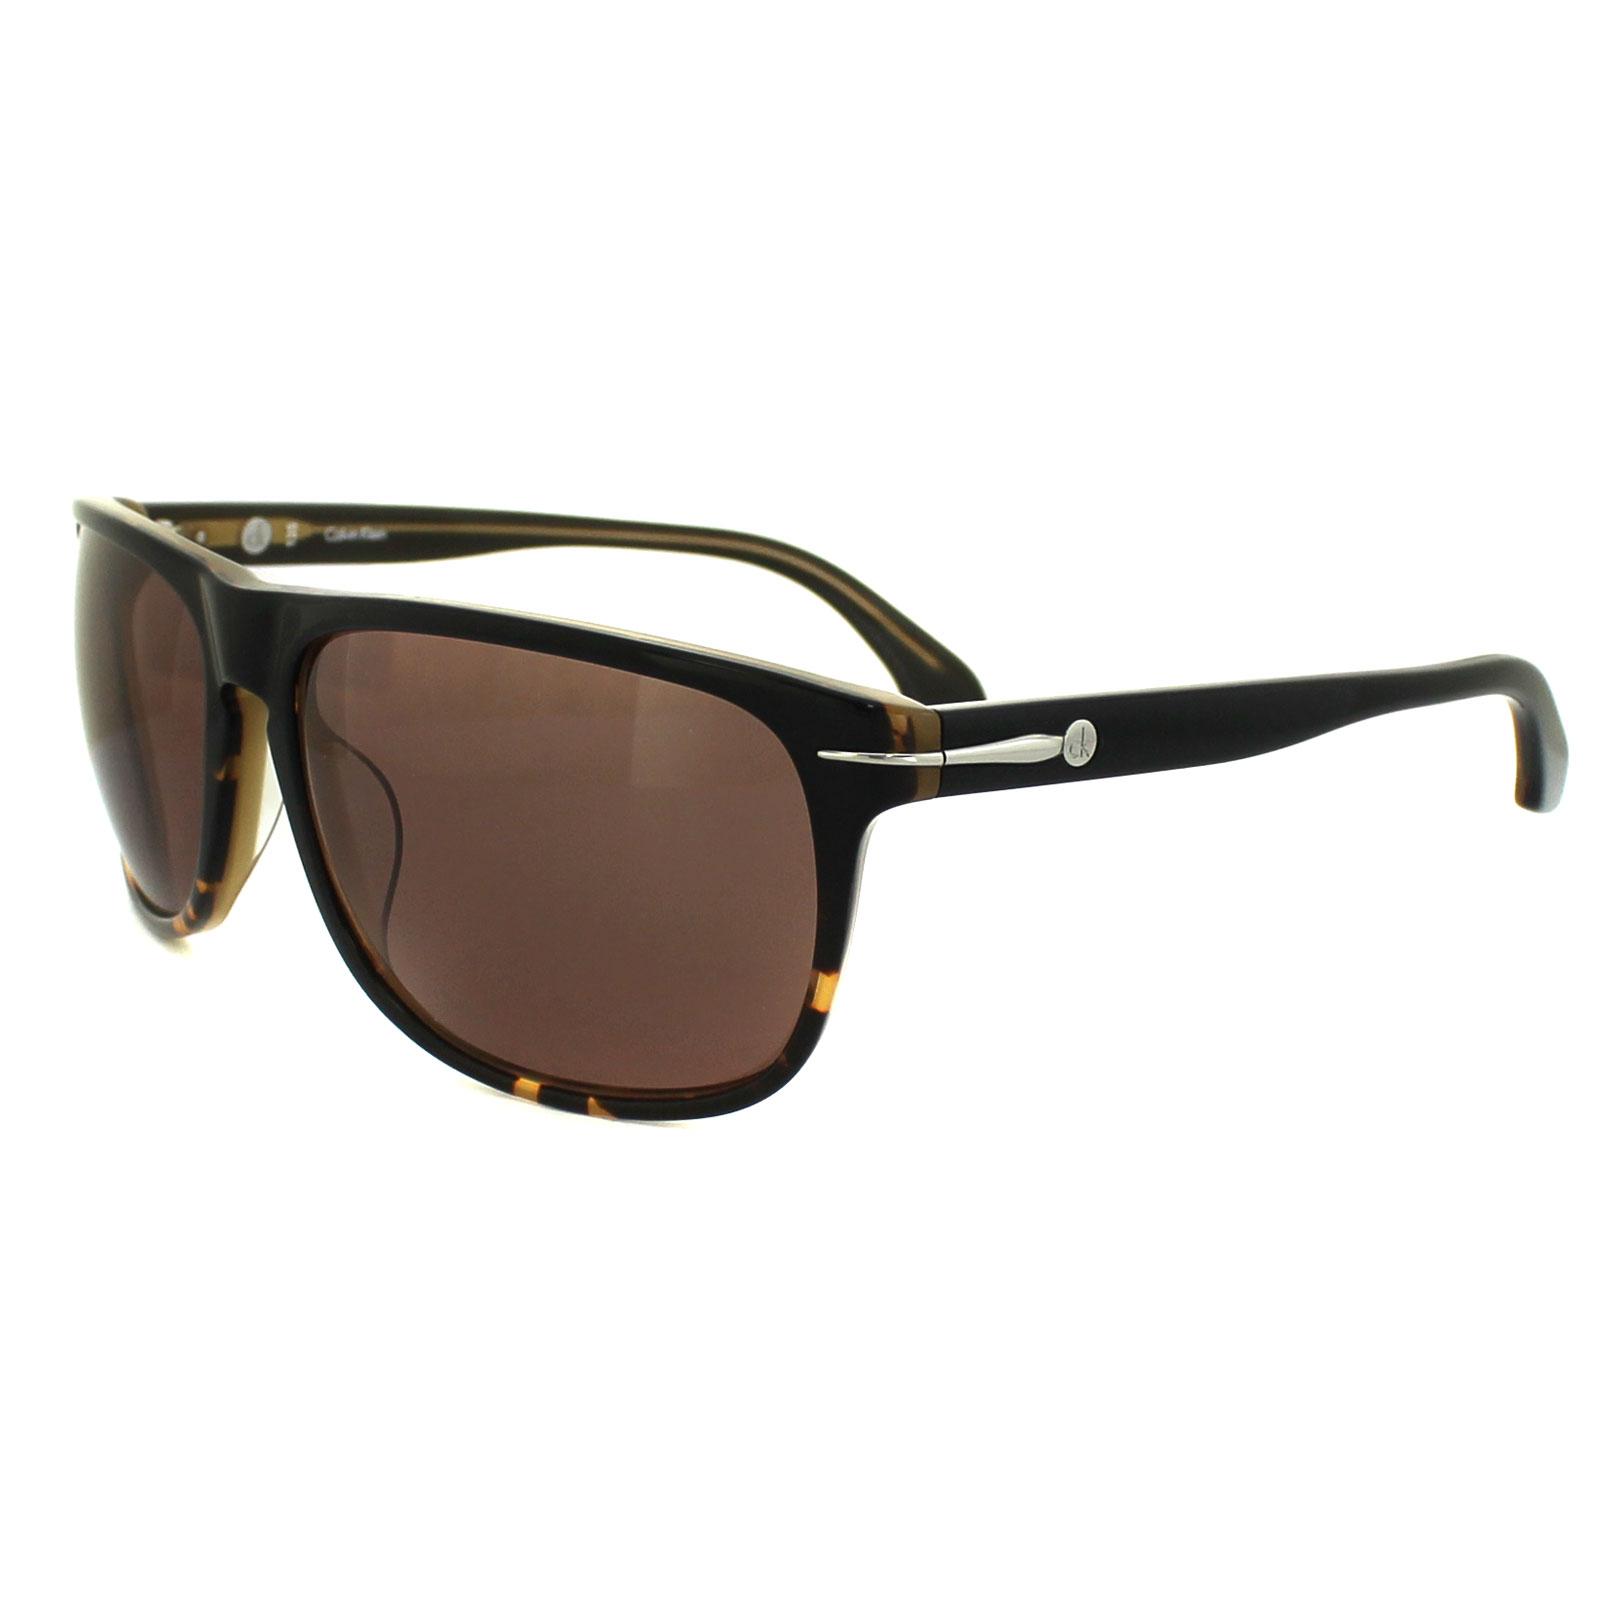 a079ccc35e Cheap Calvin Klein 4217 Sunglasses - Discounted Sunglasses